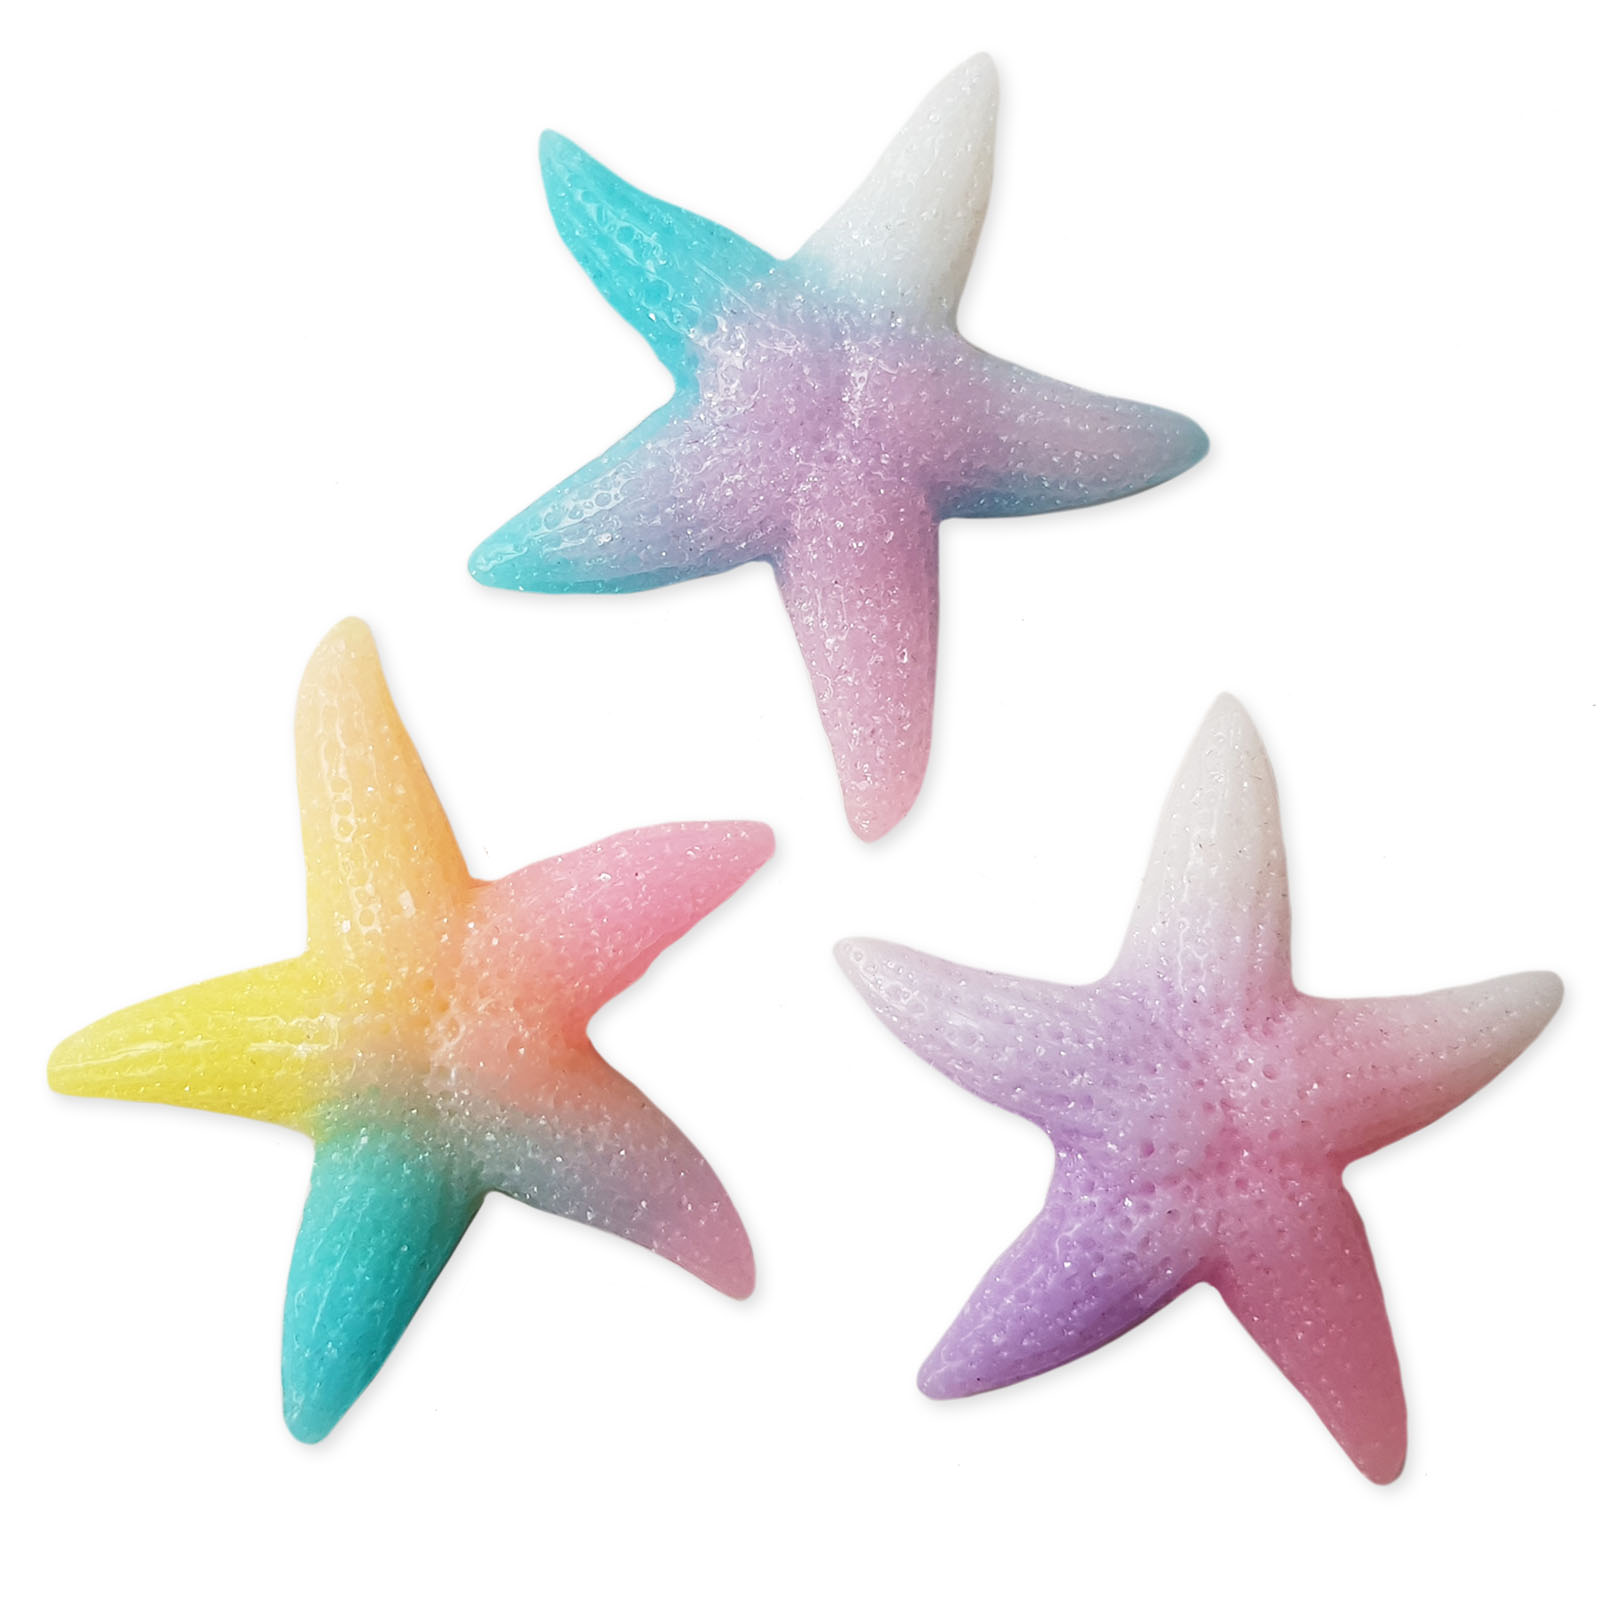 5pcs Large Resin Starfish Flatback Cabochons Embellishment Craft Charms